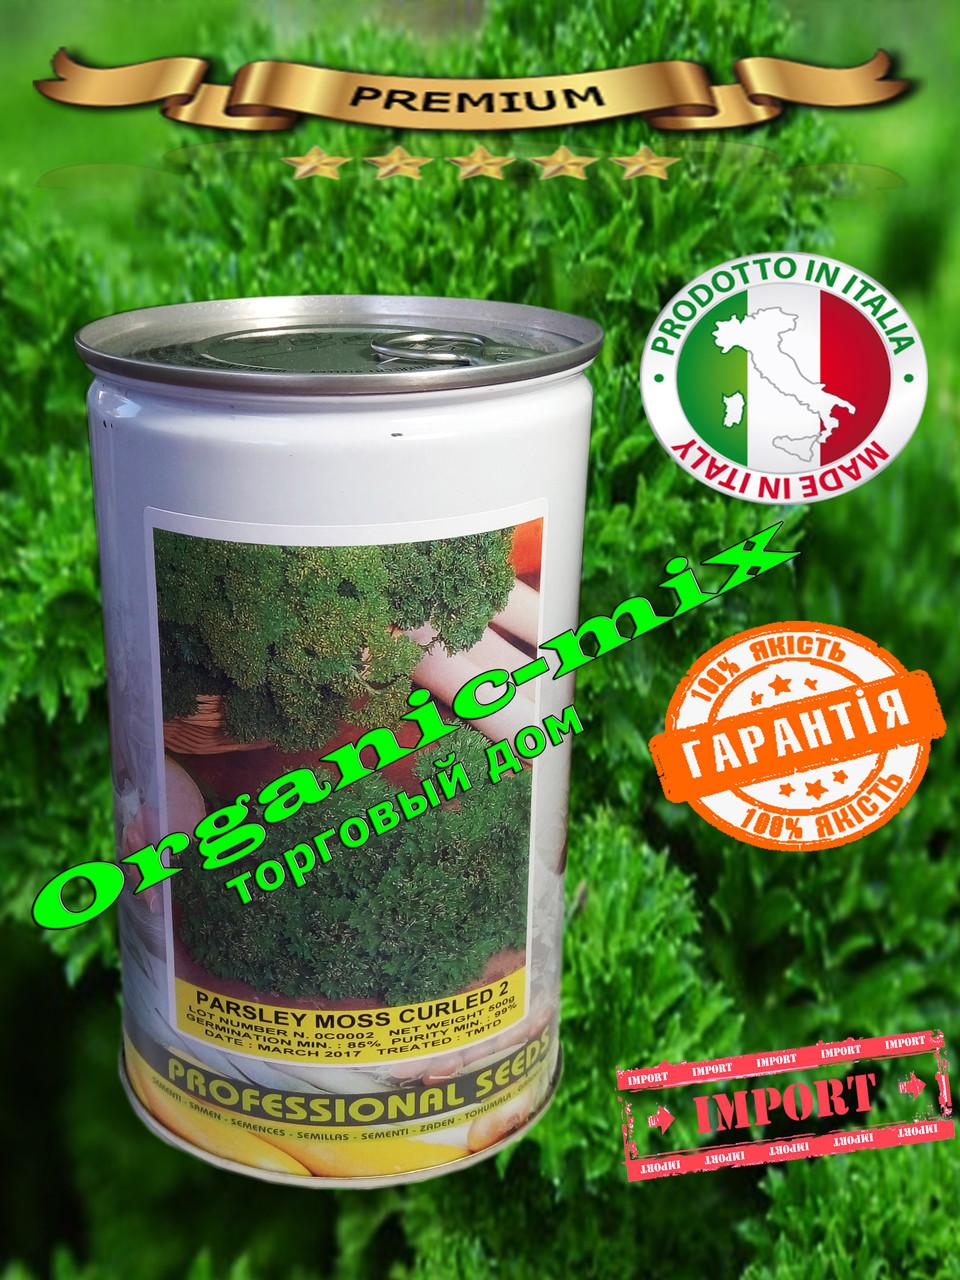 Петрушка кучерявая Мосс / Moss curled 2, Италия Hortus, банка 500 грамм, фото 1